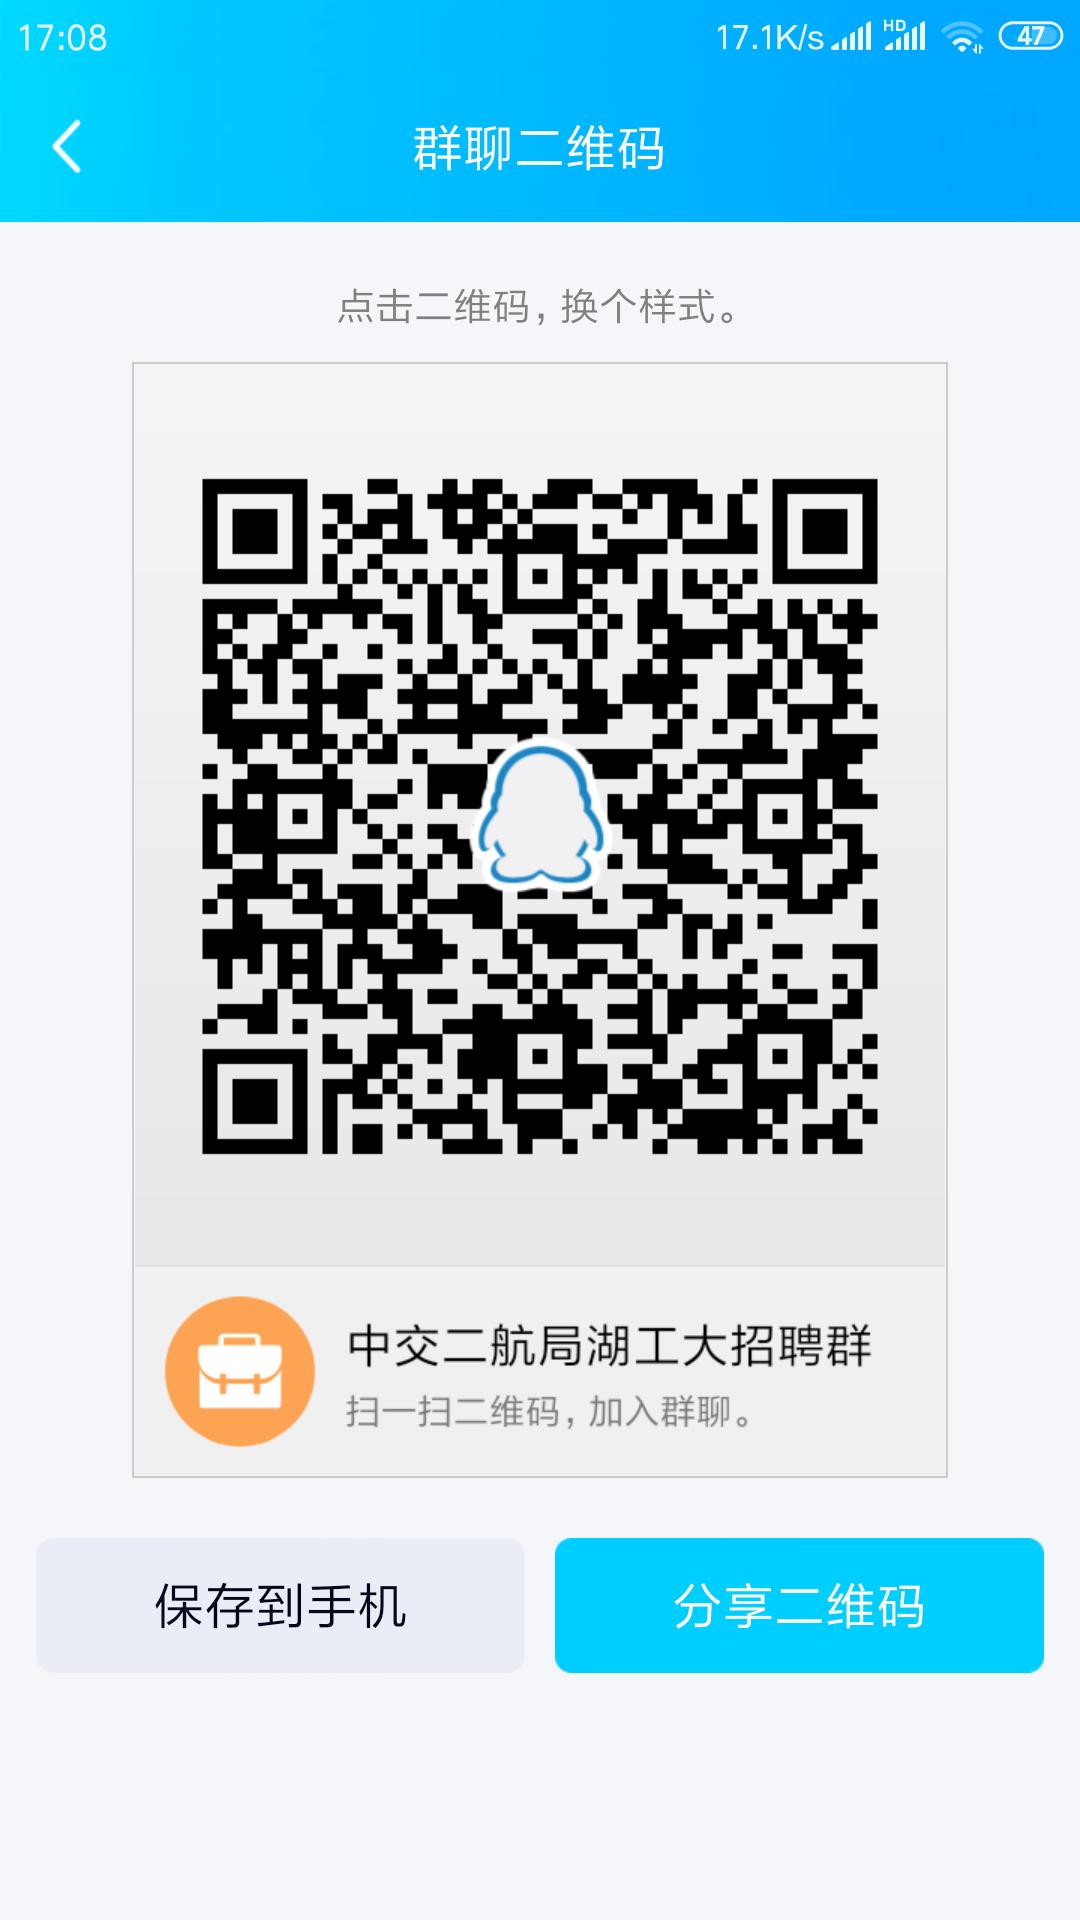 Screenshot_2019-09-12-17-08-43-225_com.tencent.mo.png